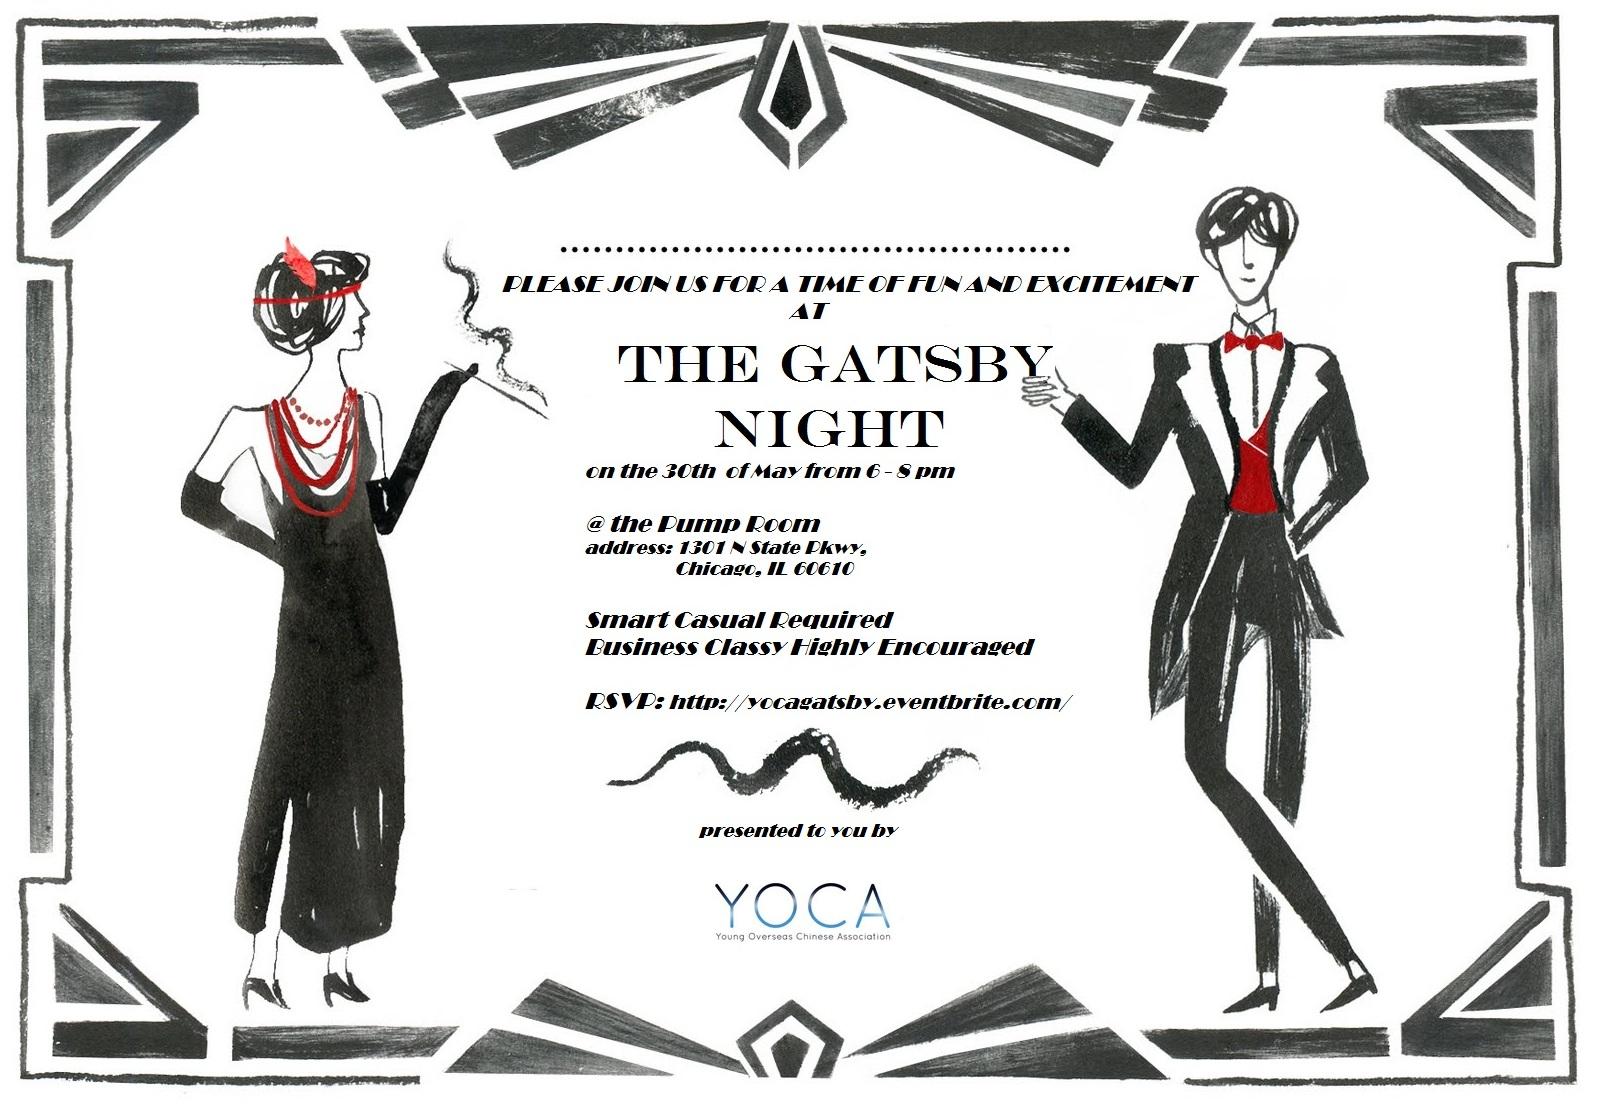 the gatsby night